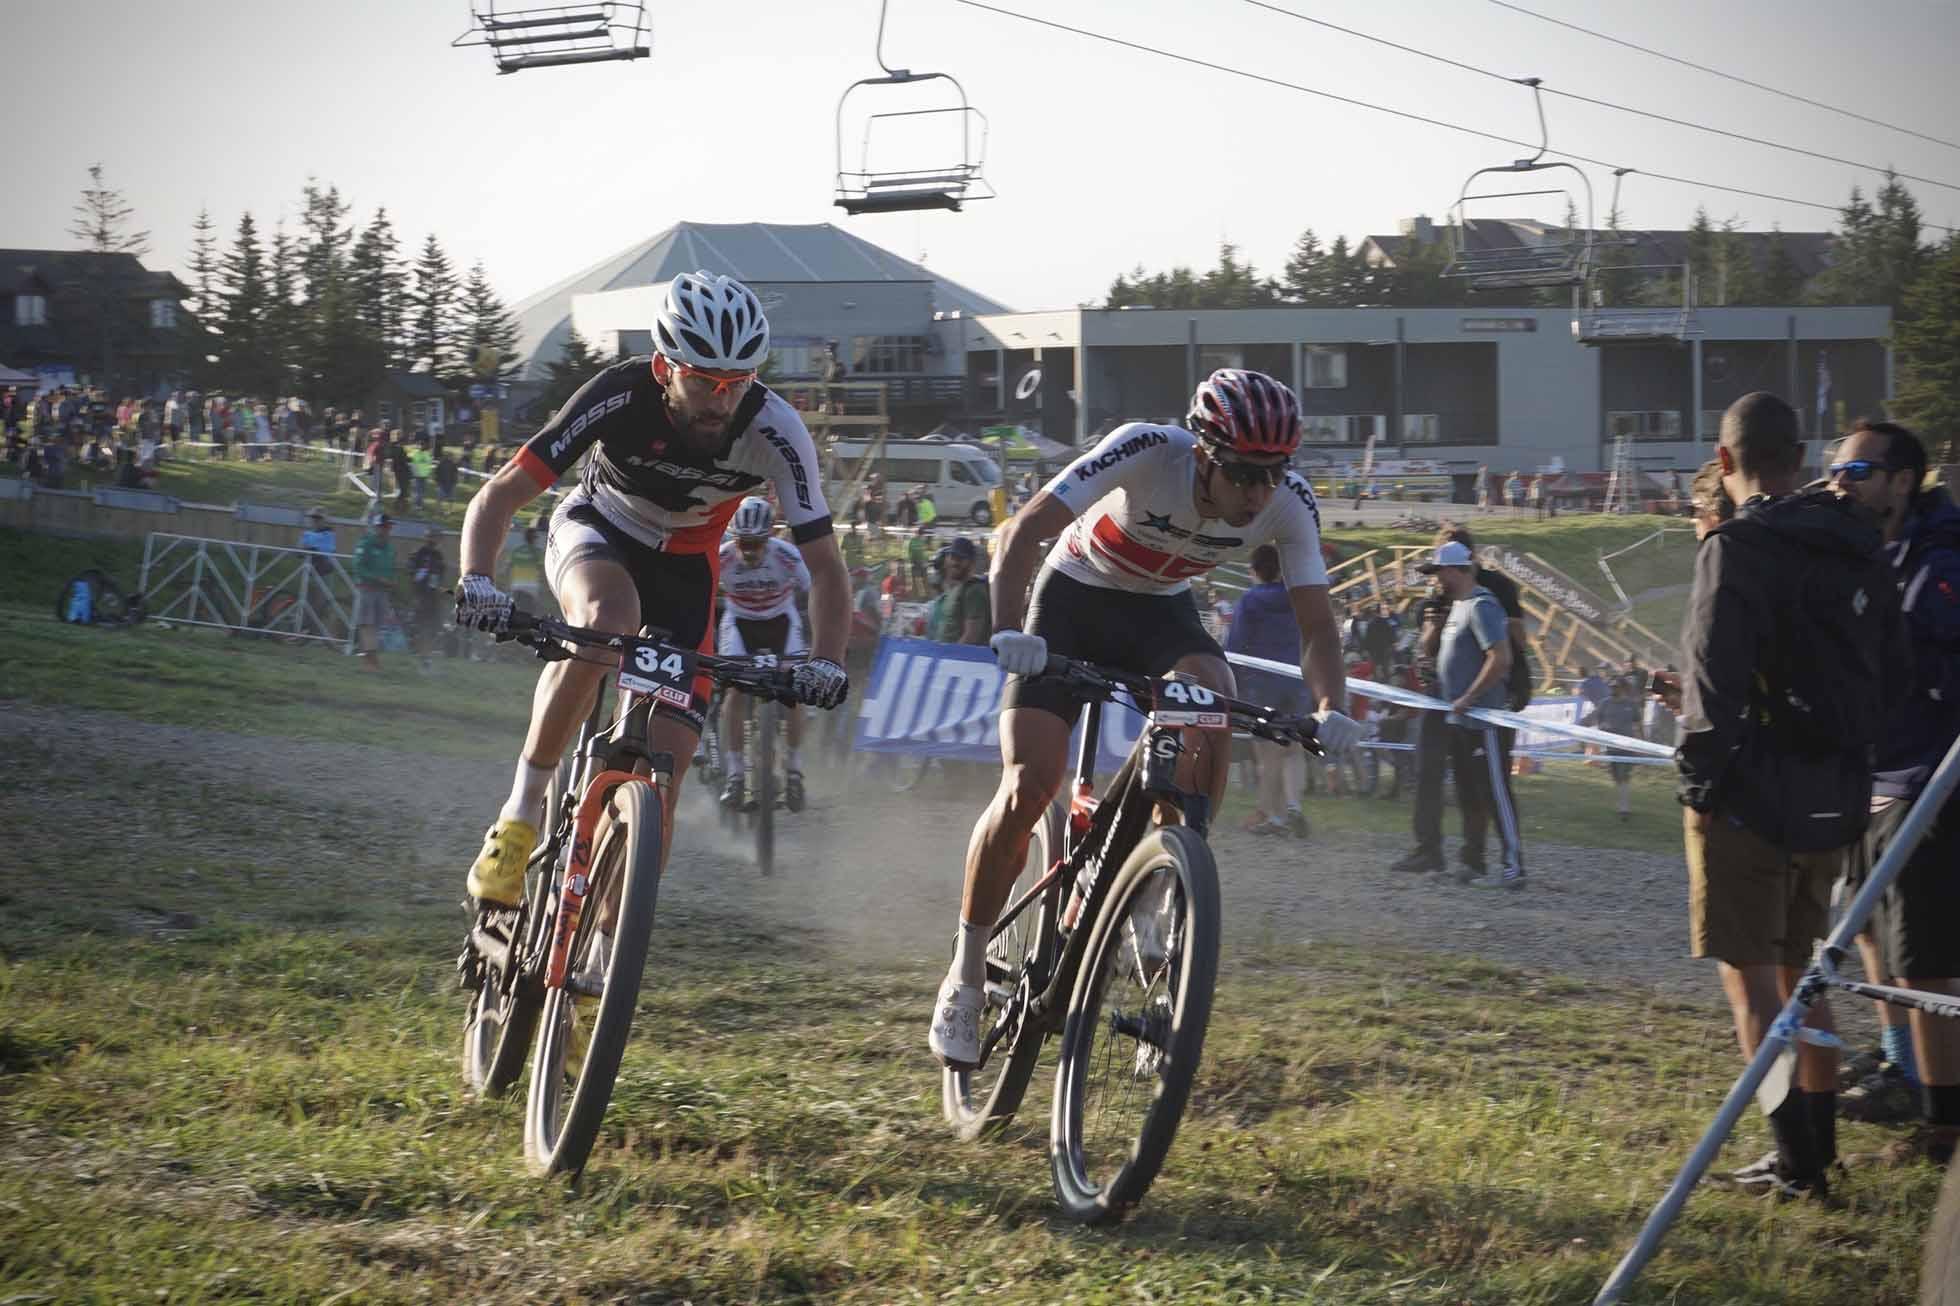 MERCEDES-BENZ UCI MTB WORLD CUP